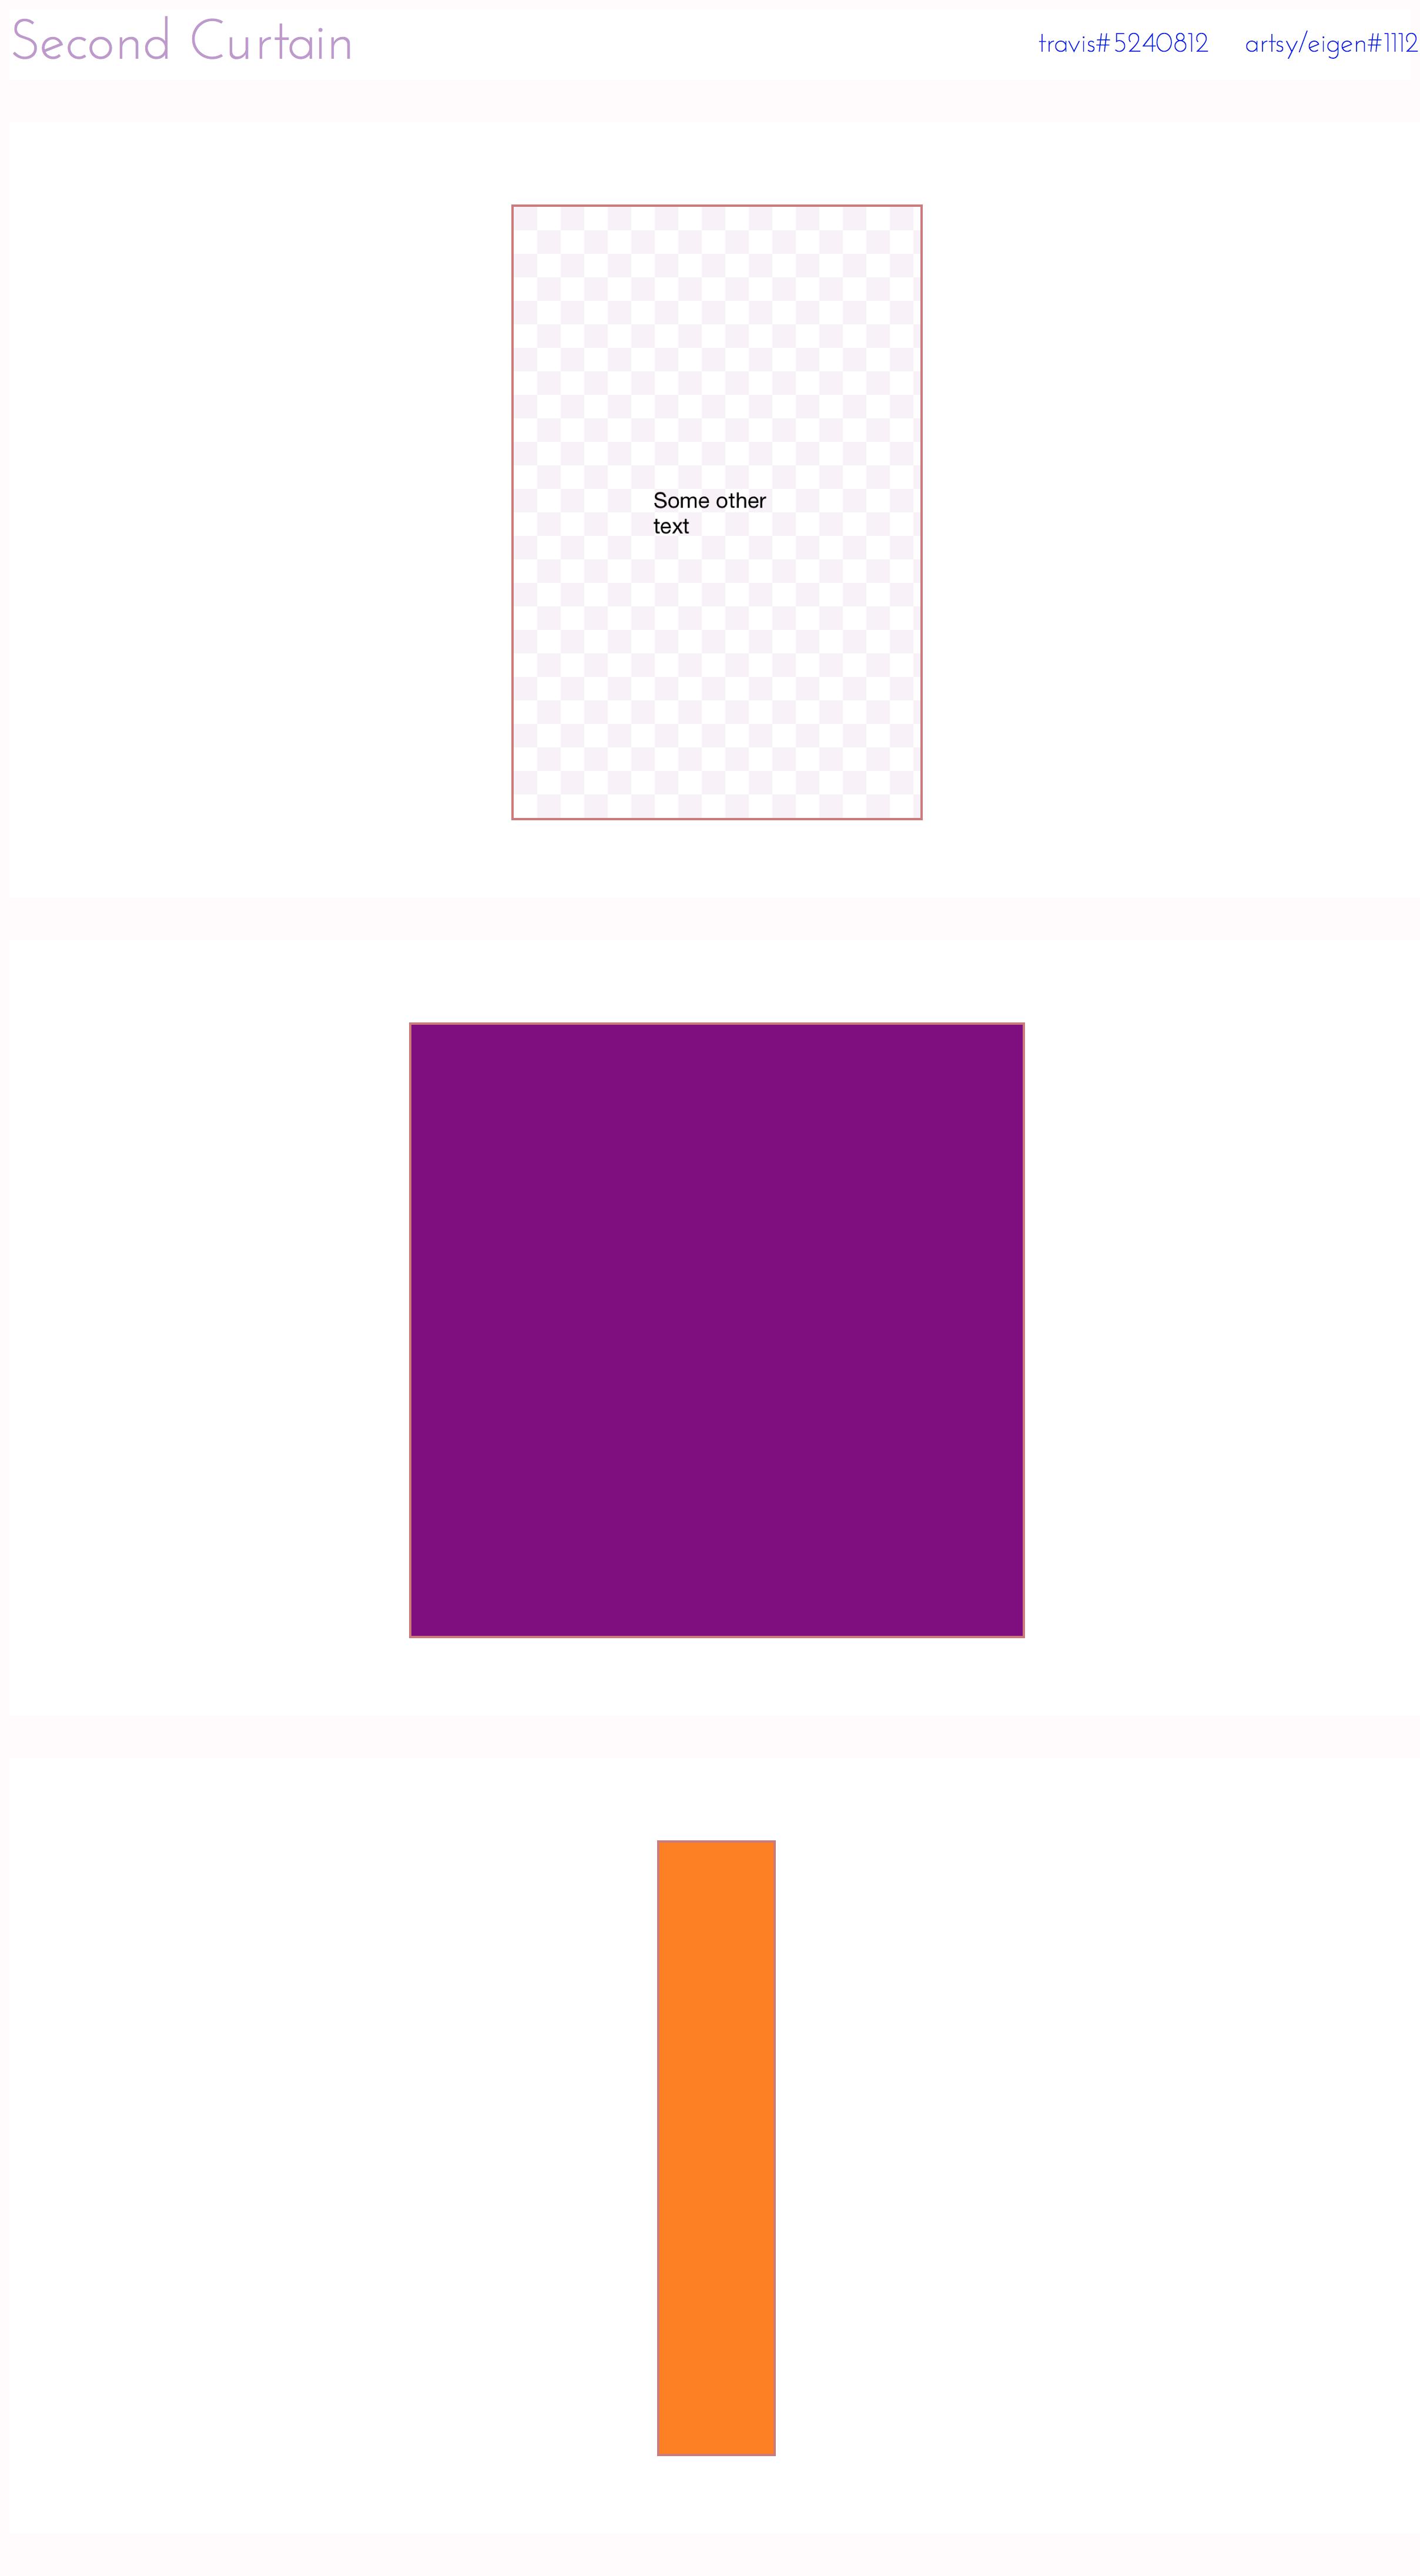 Sample diff